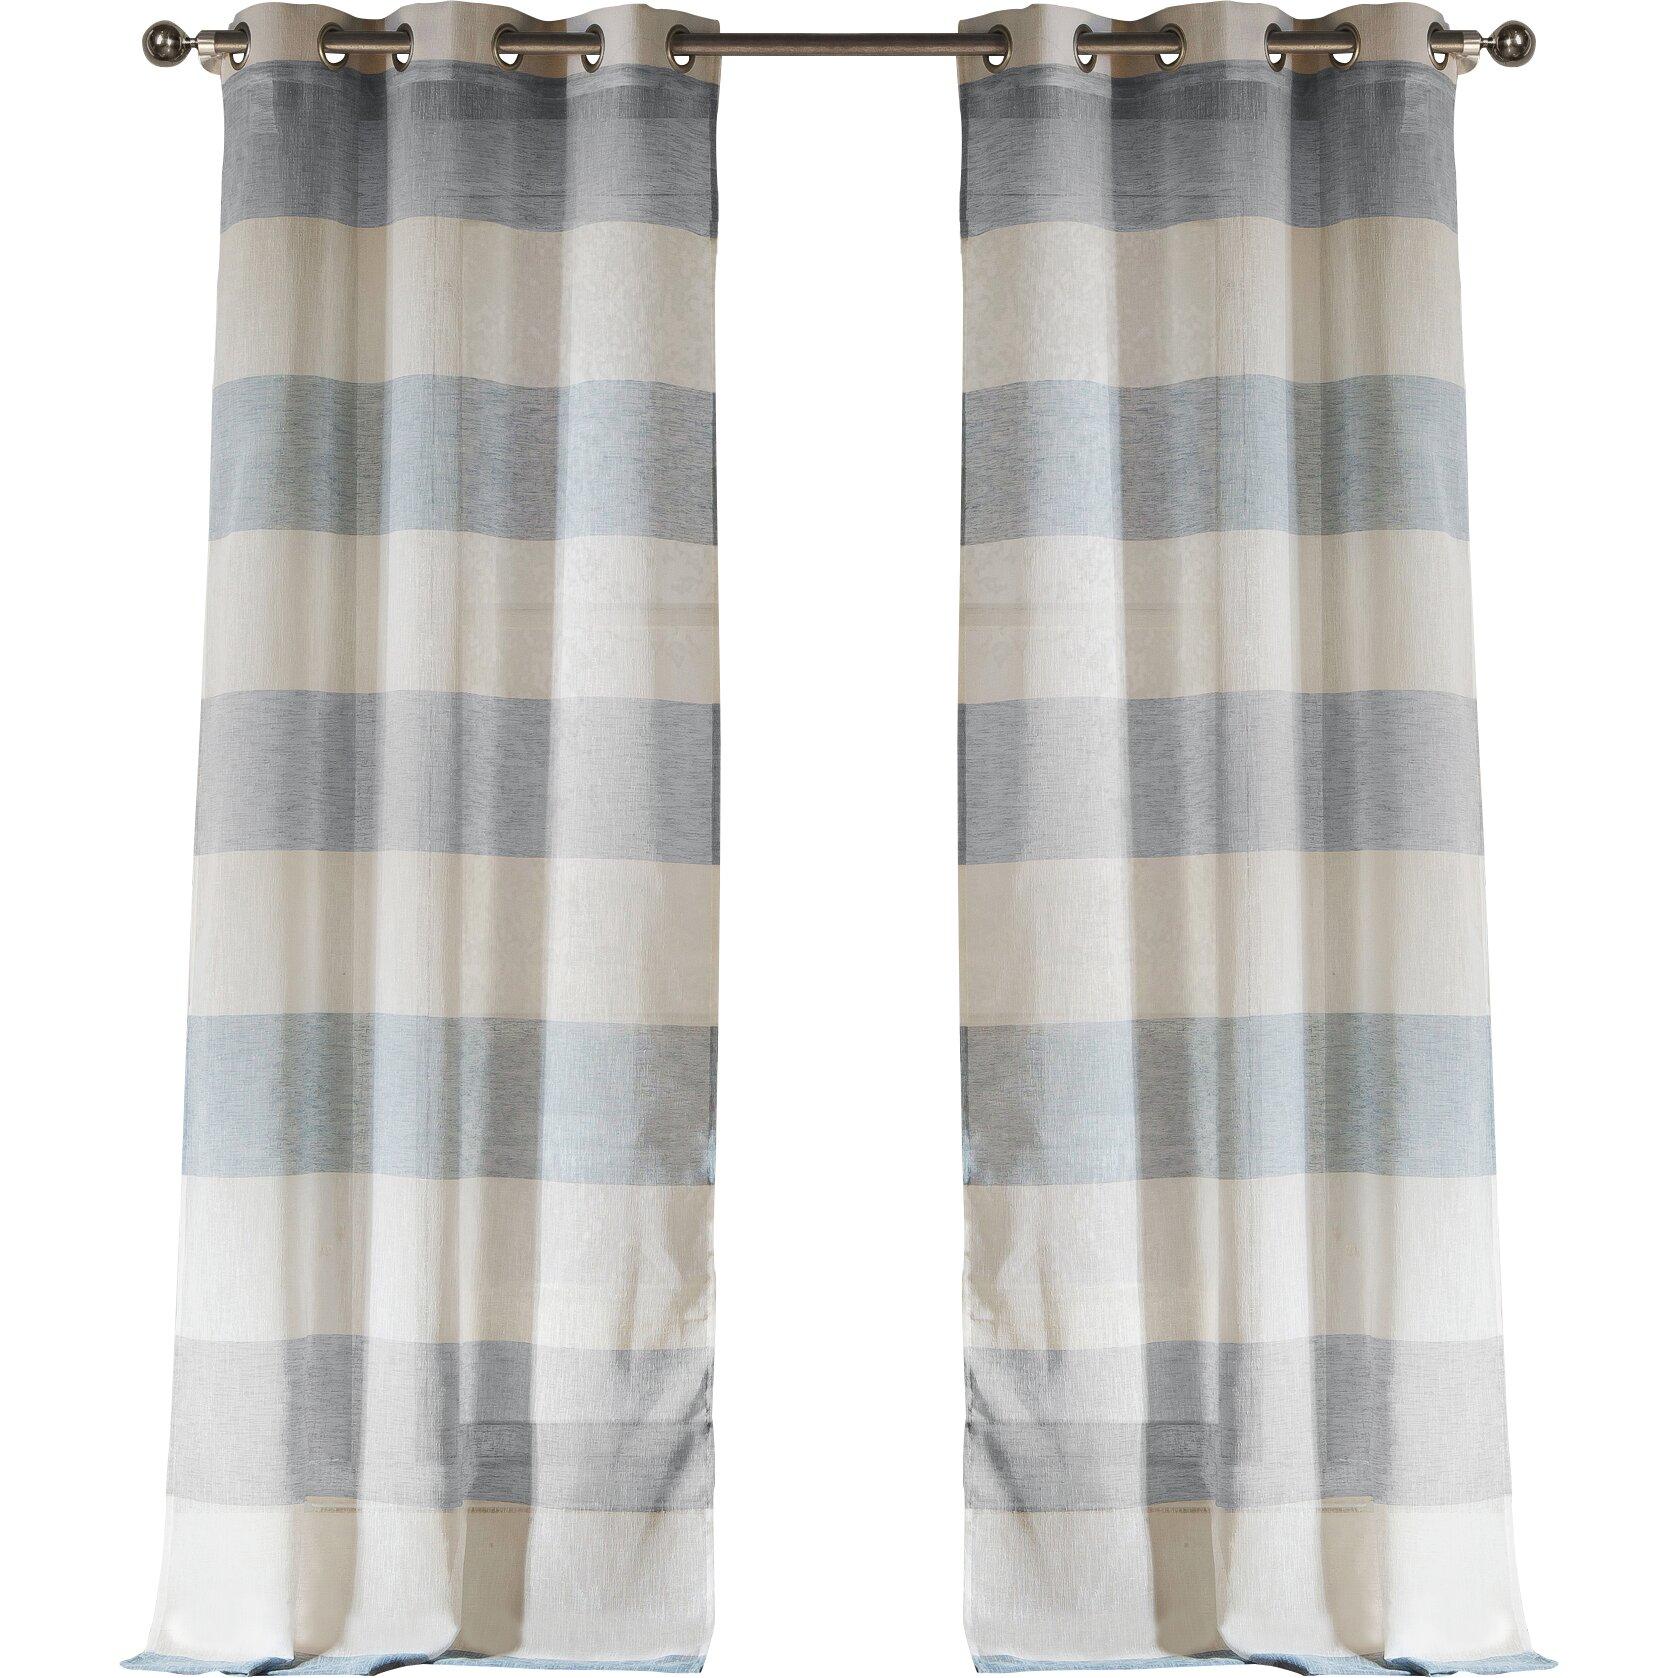 Brown plaid curtain panels - Hiltonia Striped Semi Sheer Grommet Curtain Panels